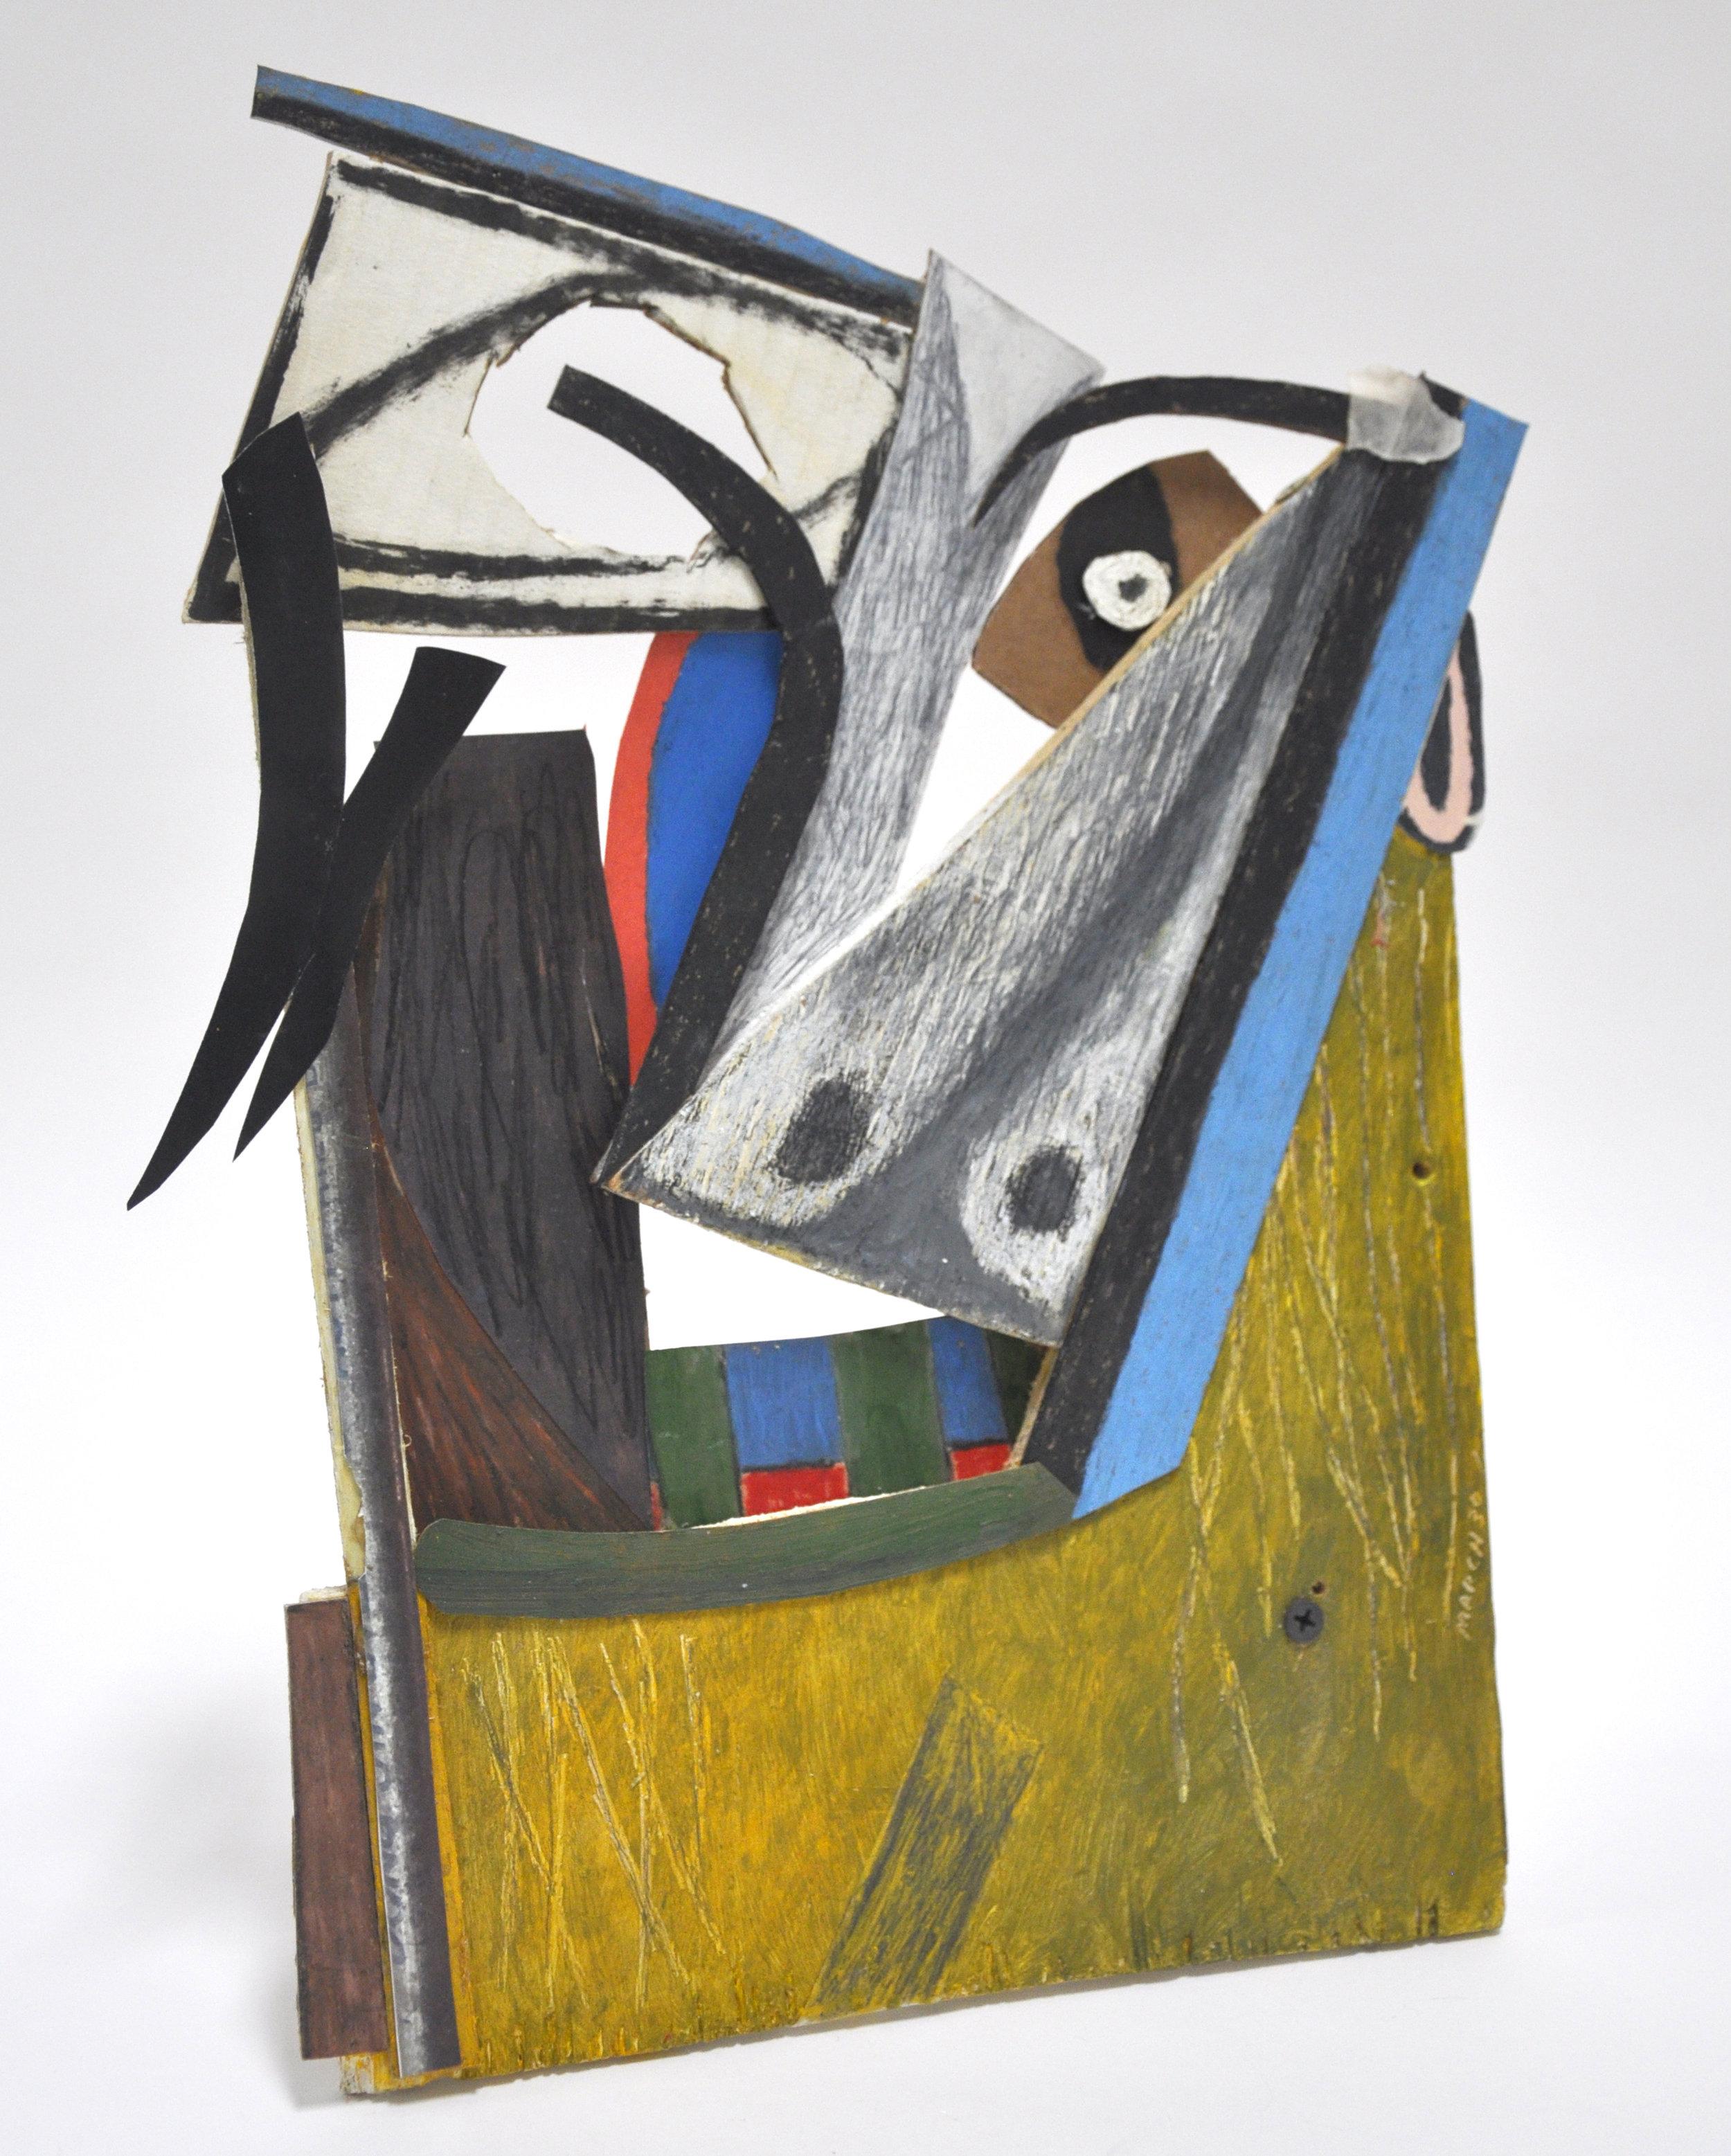 "Isaac Vazquez-Avila, ""ESL Assemblage"", paper, house paint, nails, wood, 9 1/2 x 12 in, 2018"